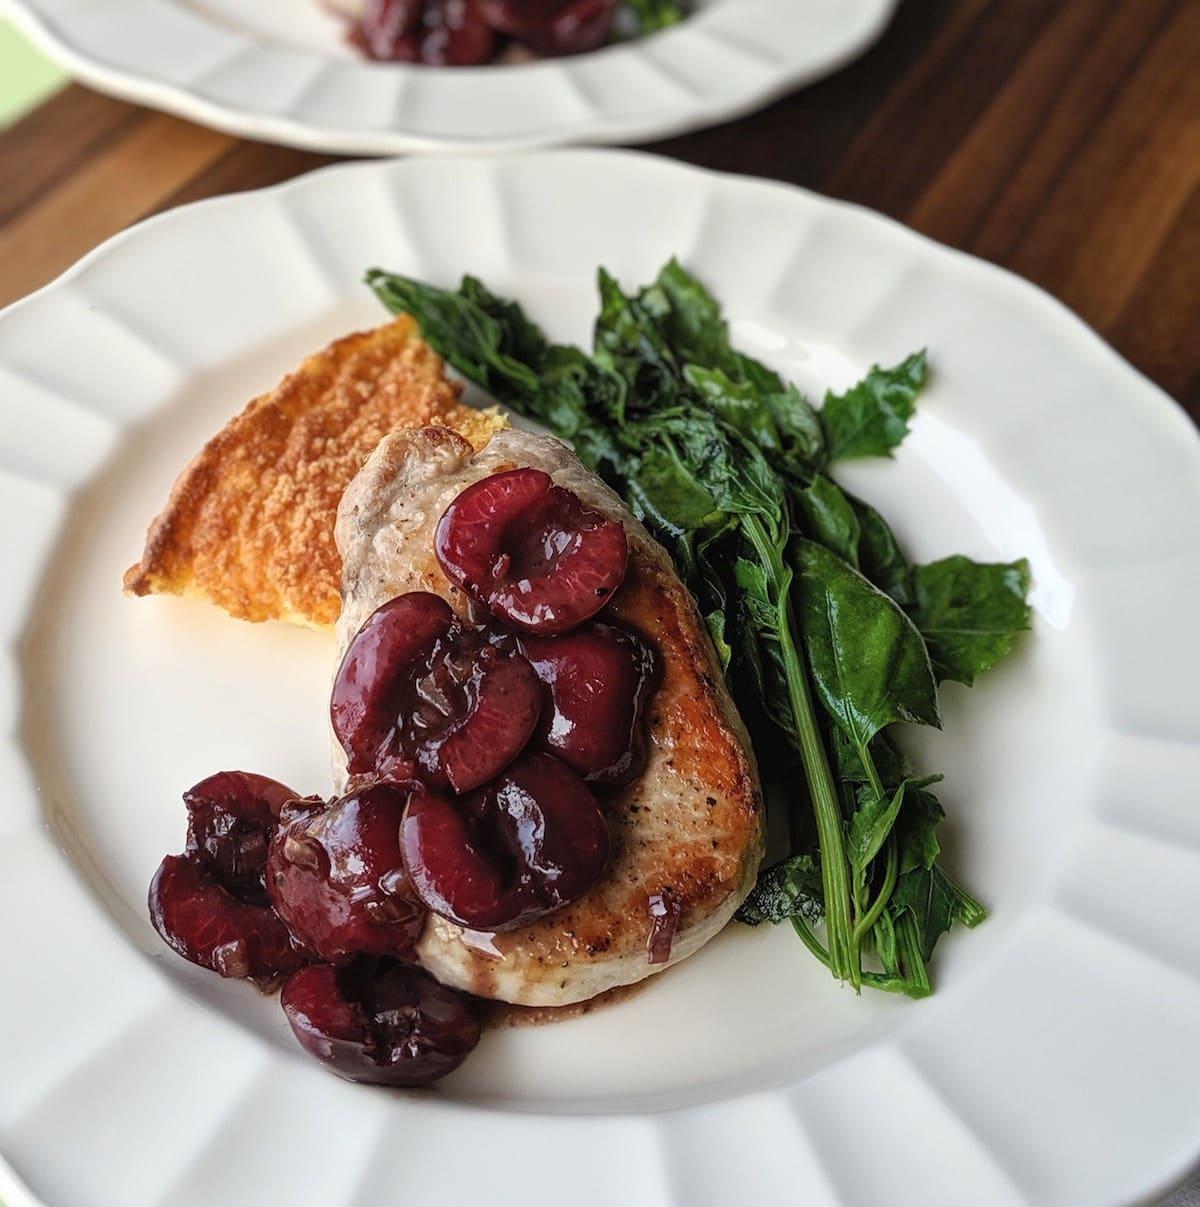 Roasted-Pork-Loin-Chops-with-Pinot-Noir-Cherry-Beurre-Rouge-Lambs-Quarters-Potato-Soufflé.jpg